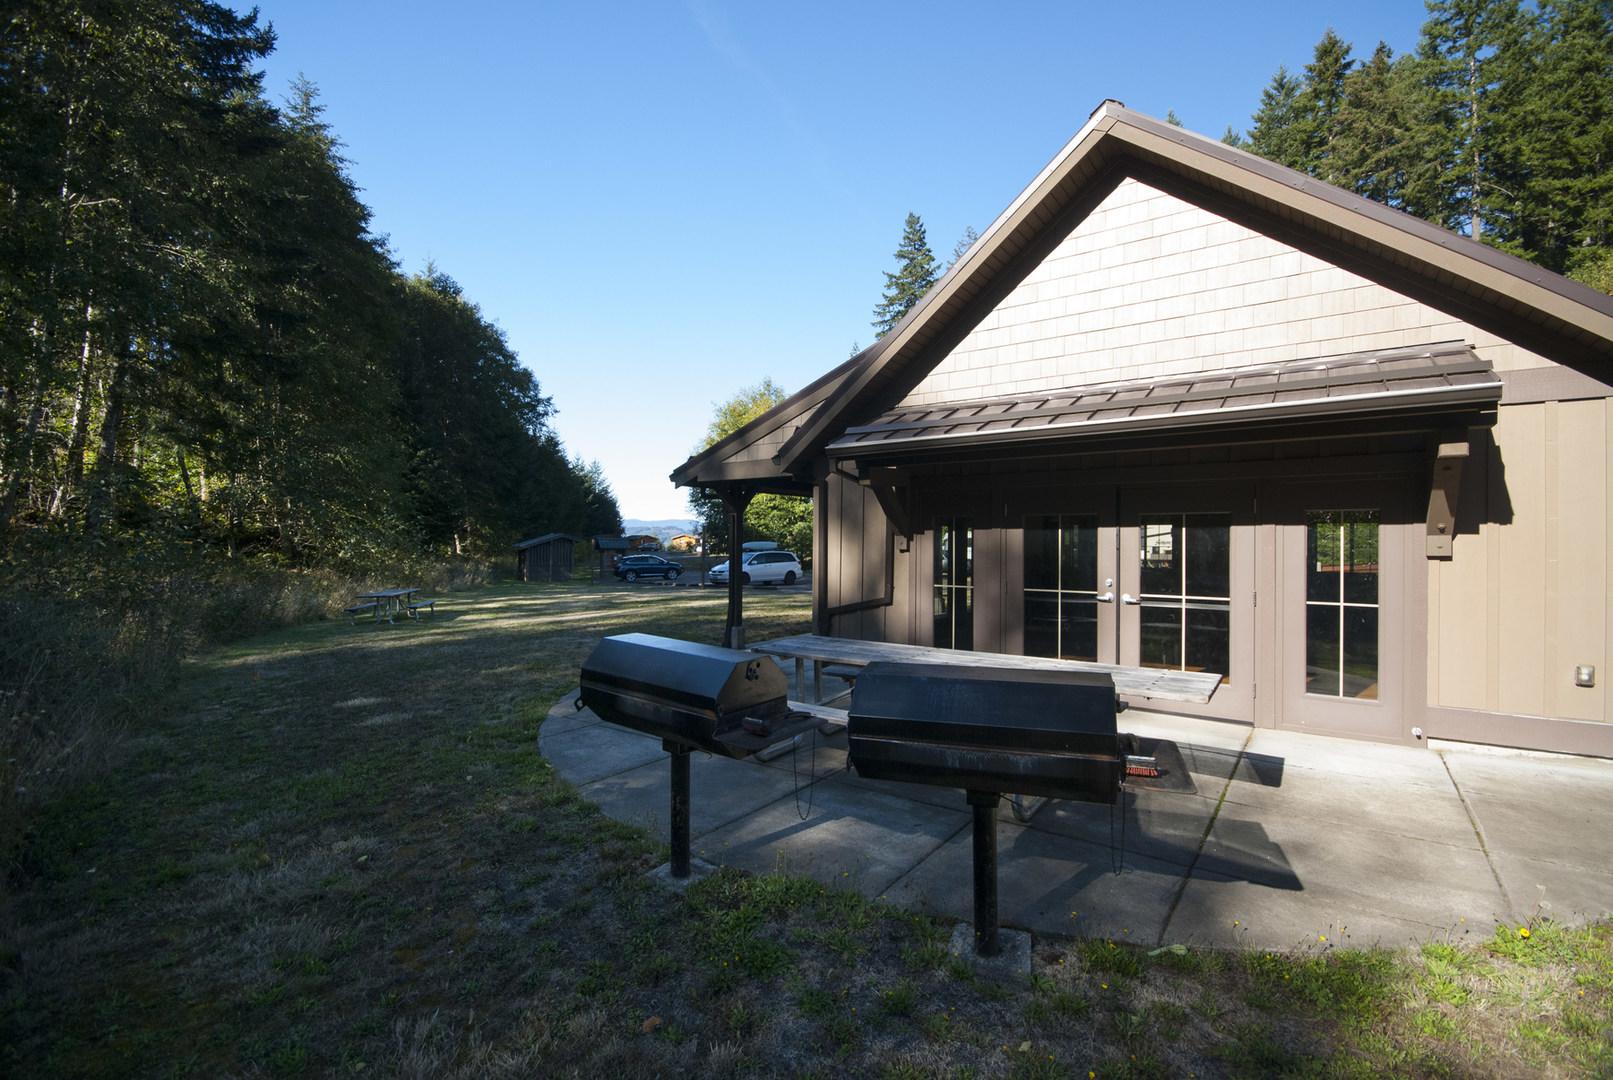 Mountain dale cabin village l l stub stewart state park for Stub stewart cabins